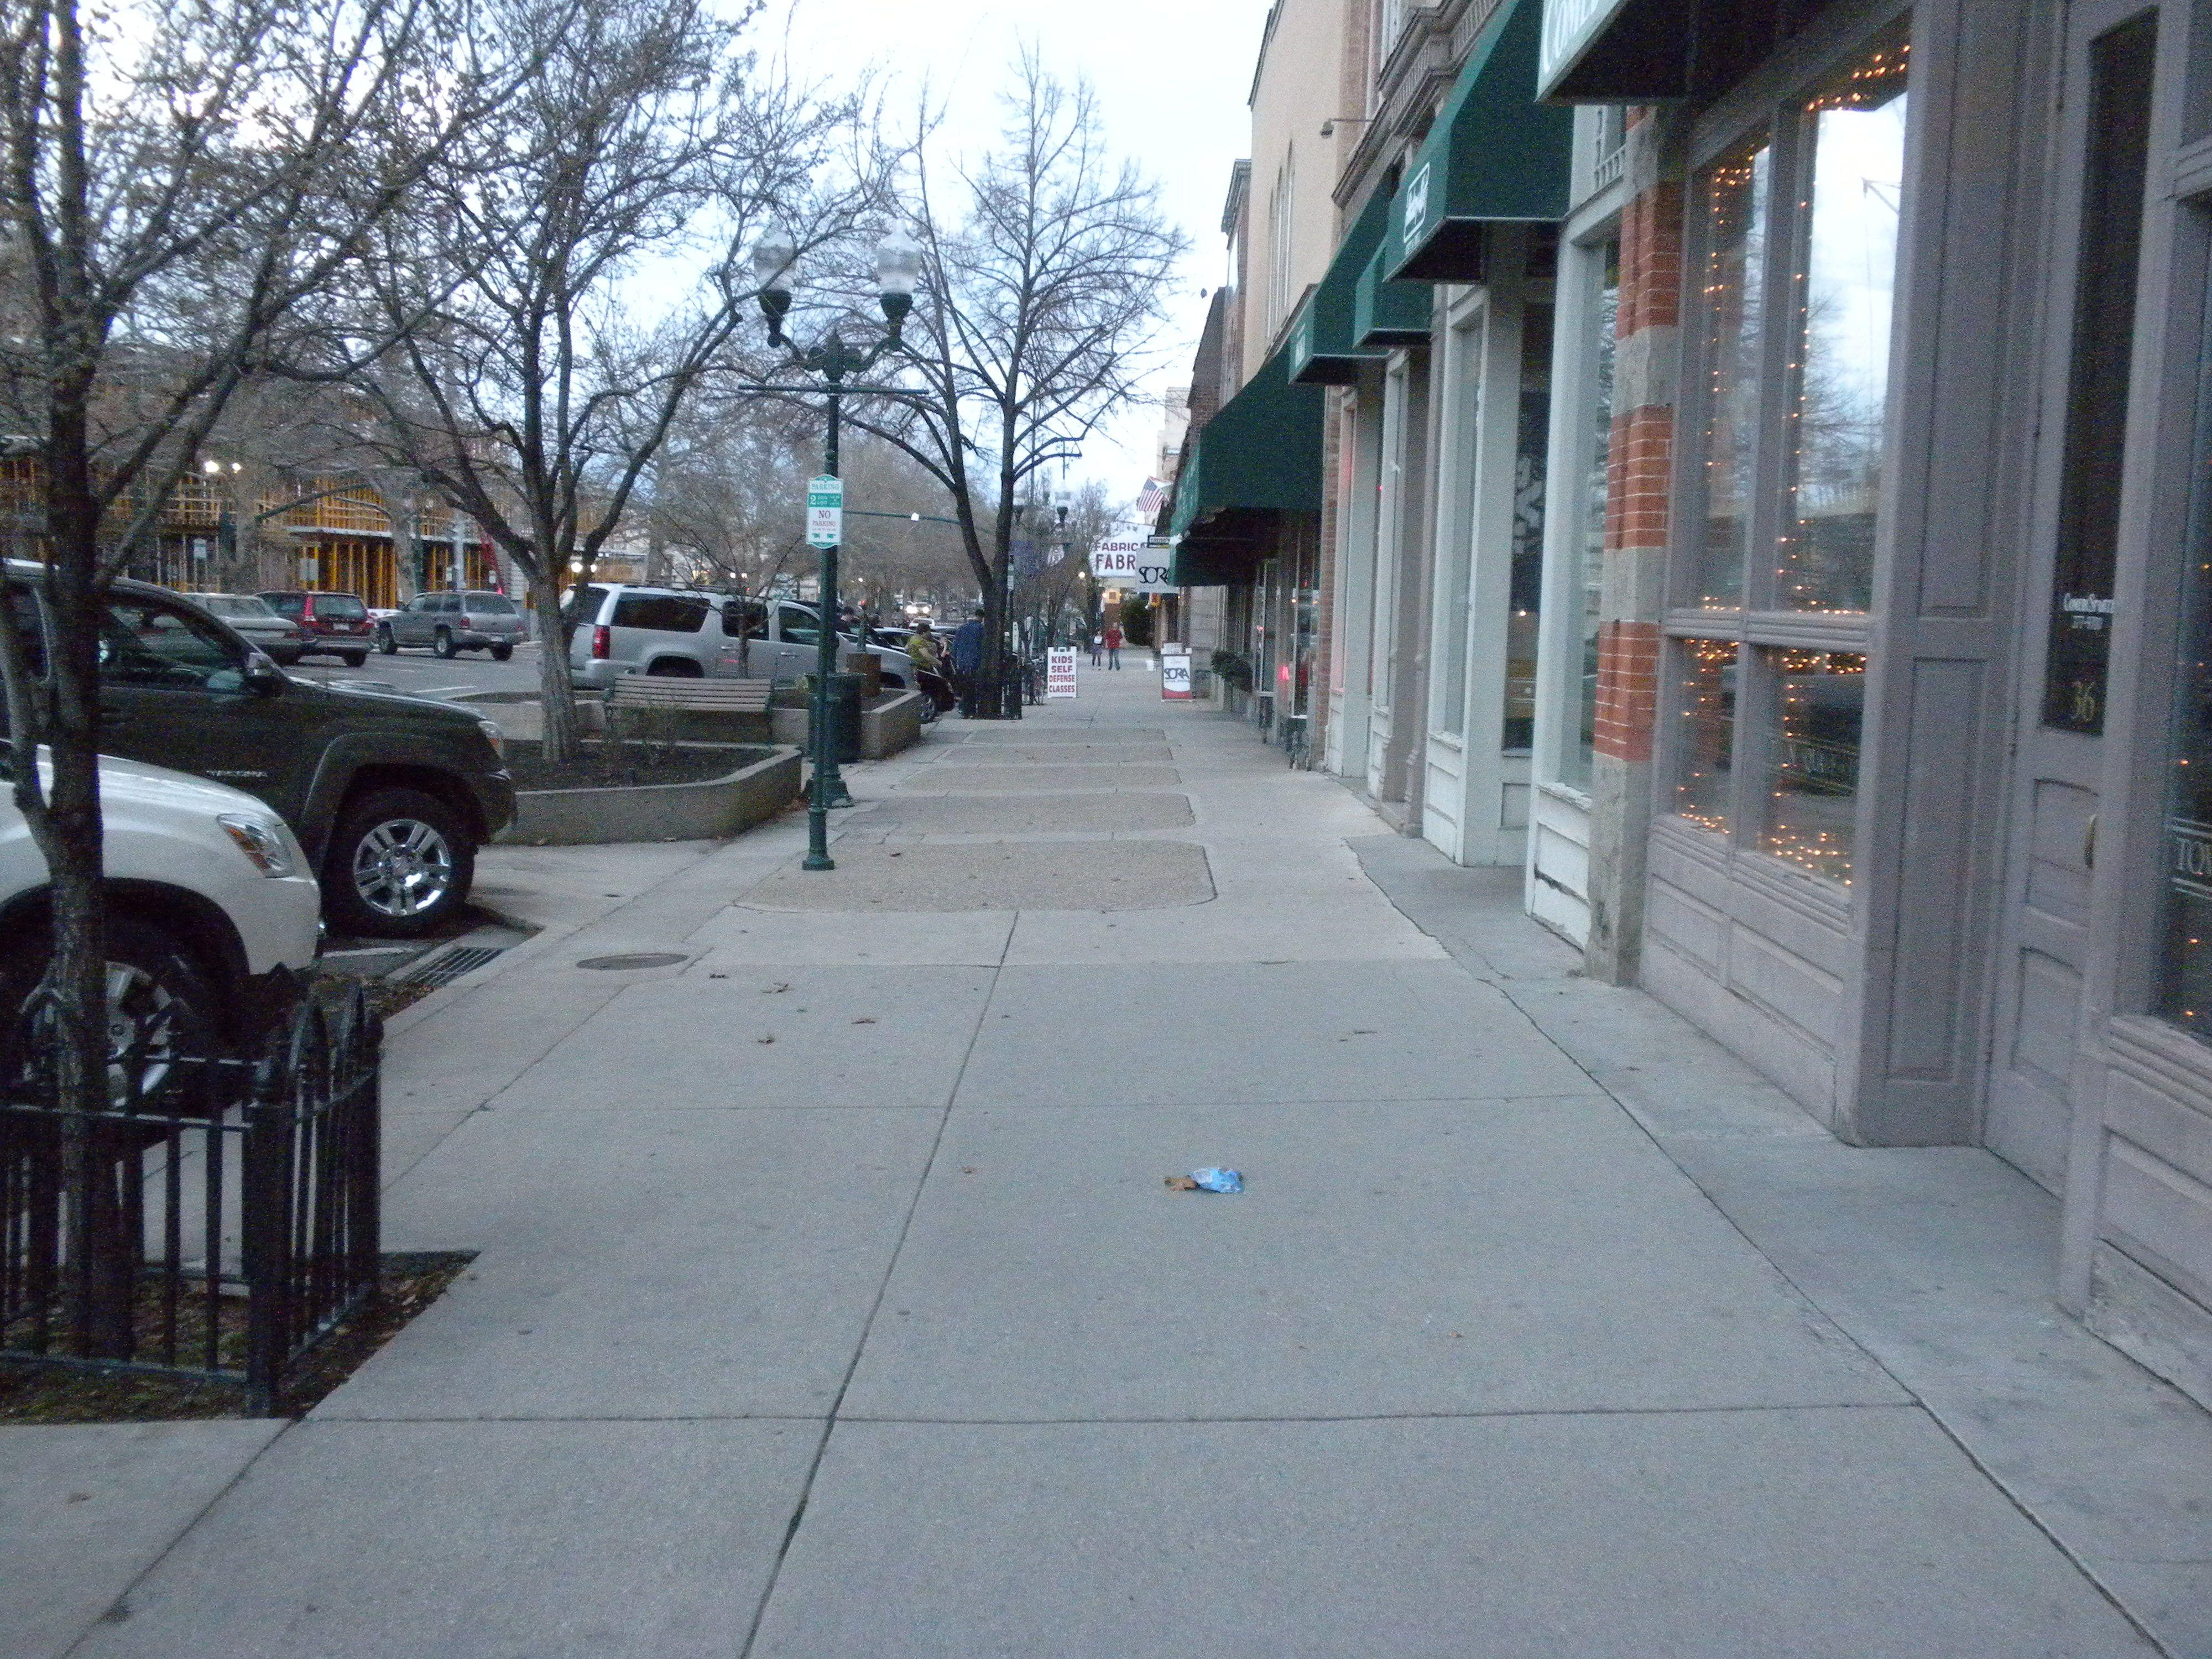 Large Sidewalk Google Search Cosplay Sidewalk Street